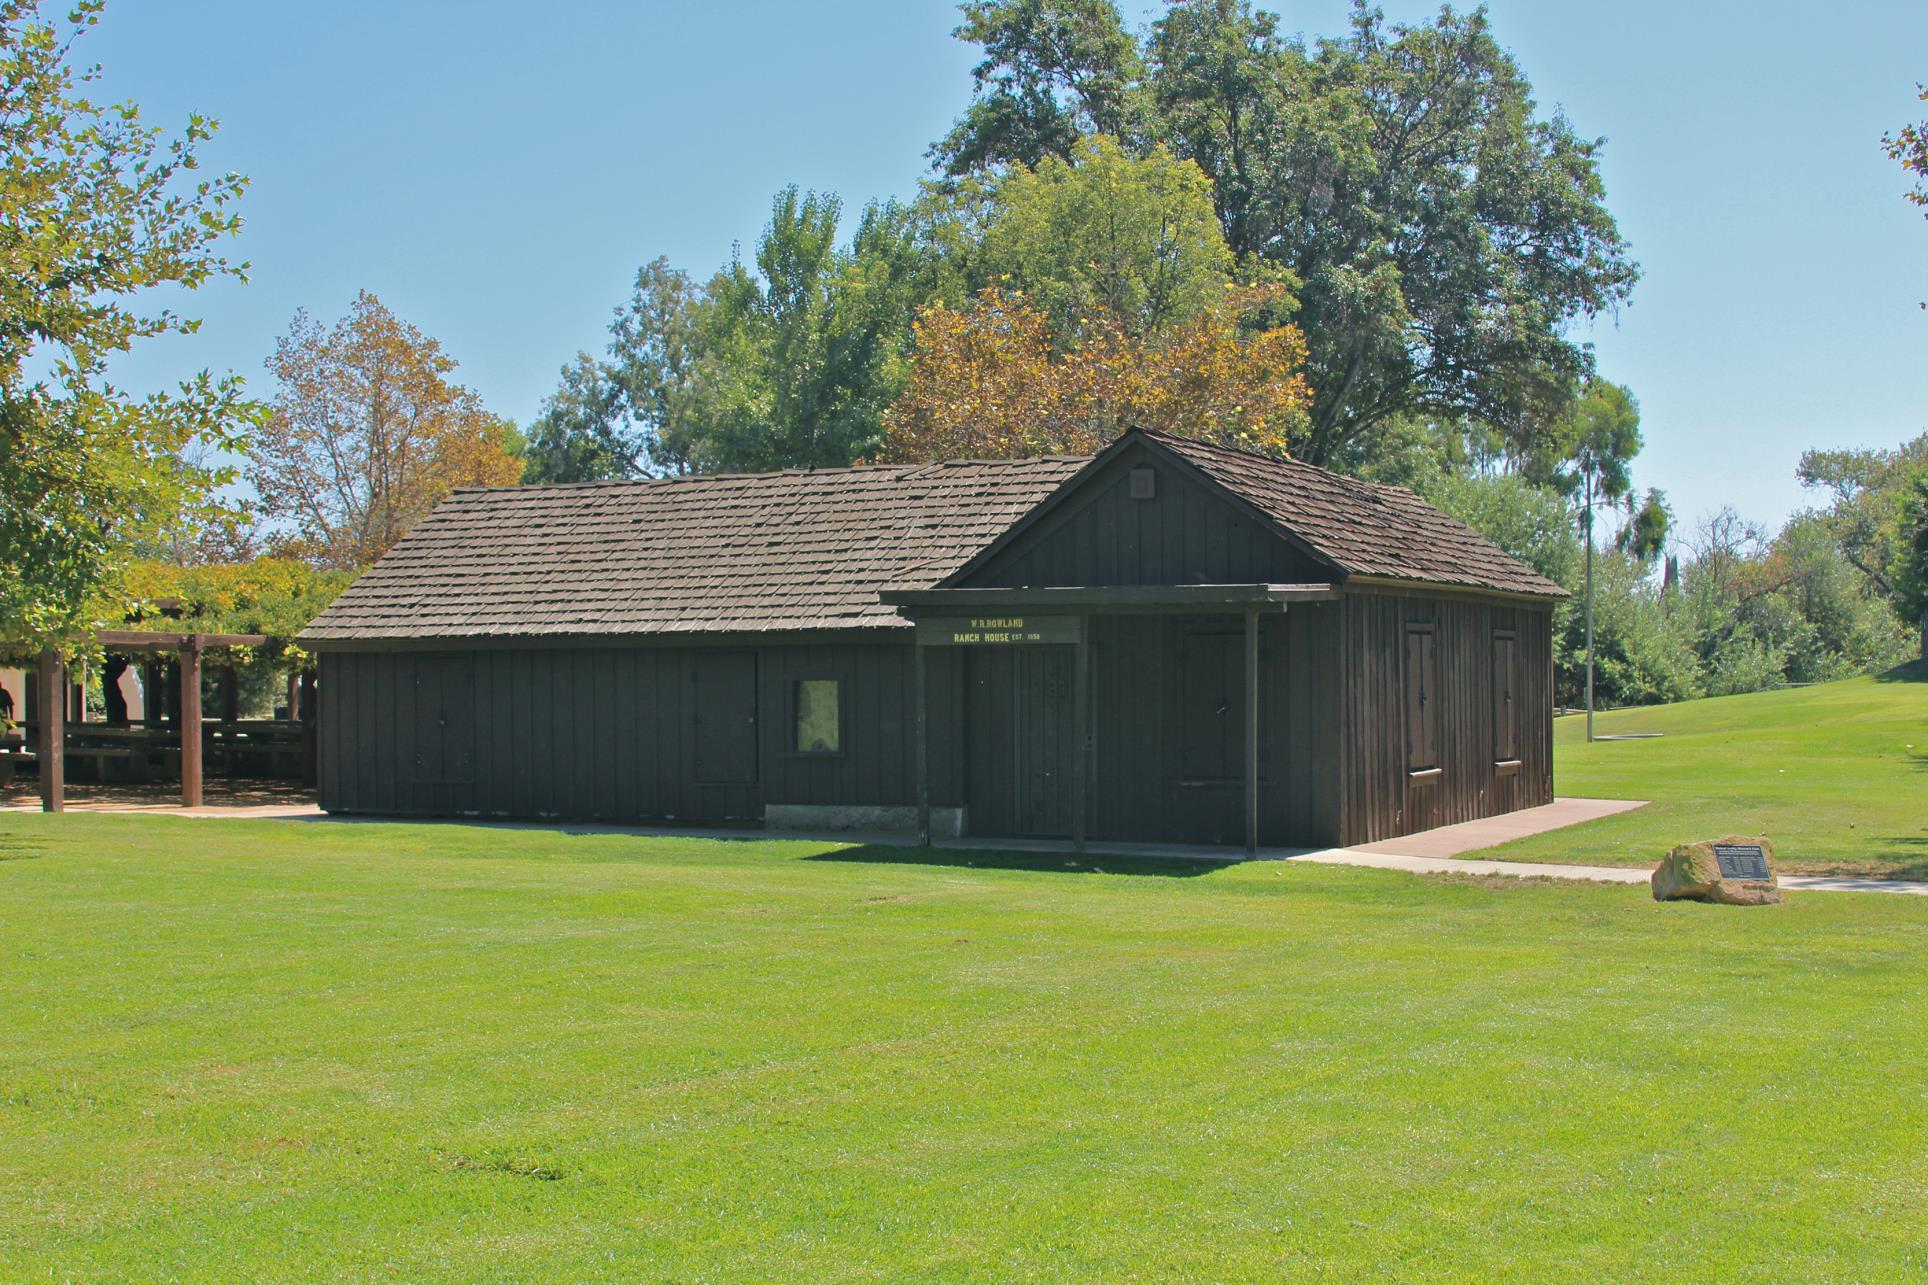 w r rowland adobe ranch house city of walnut ca